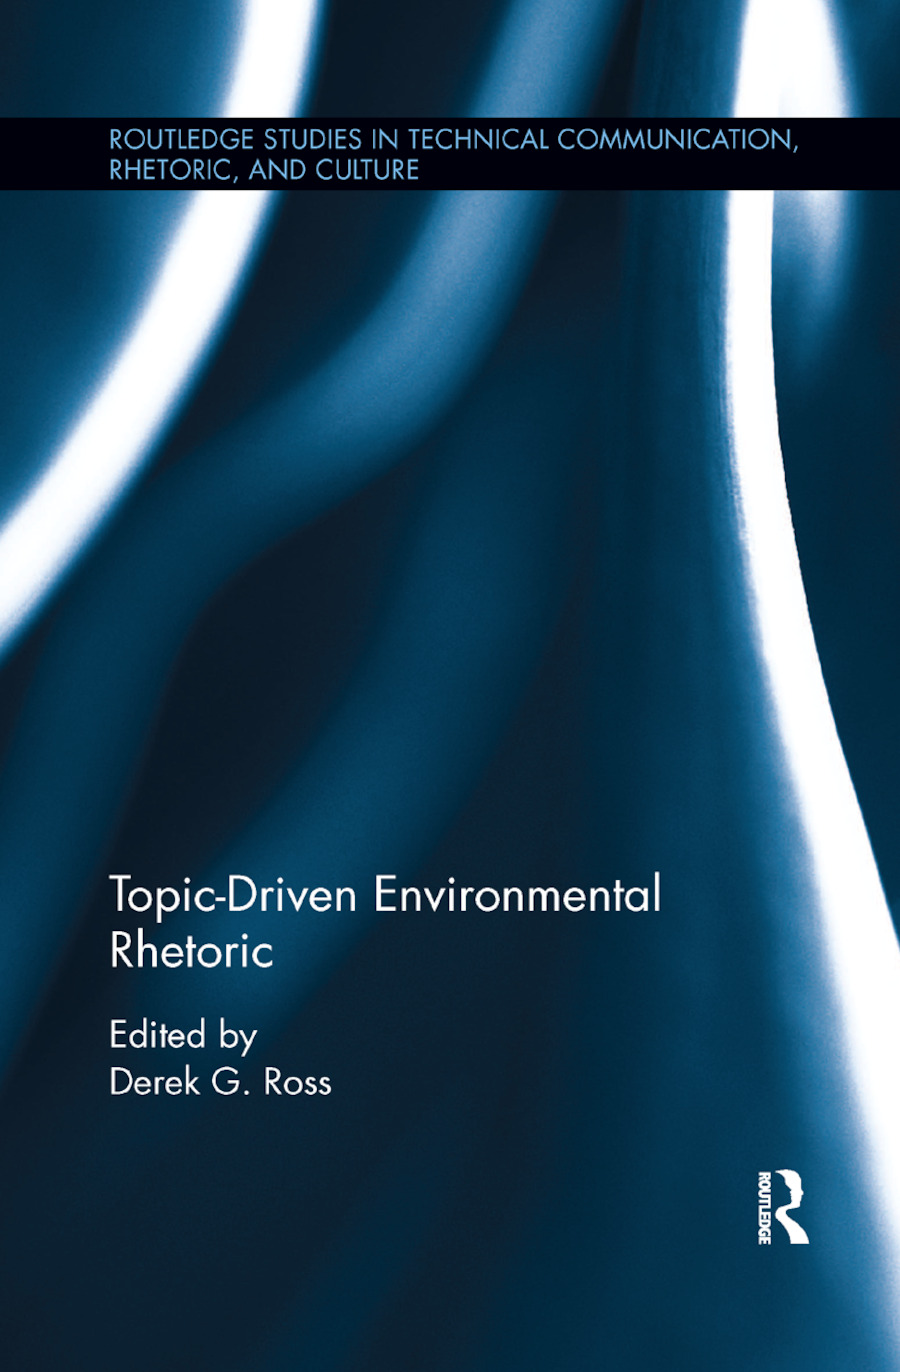 Topic-Driven Environmental Rhetoric book cover